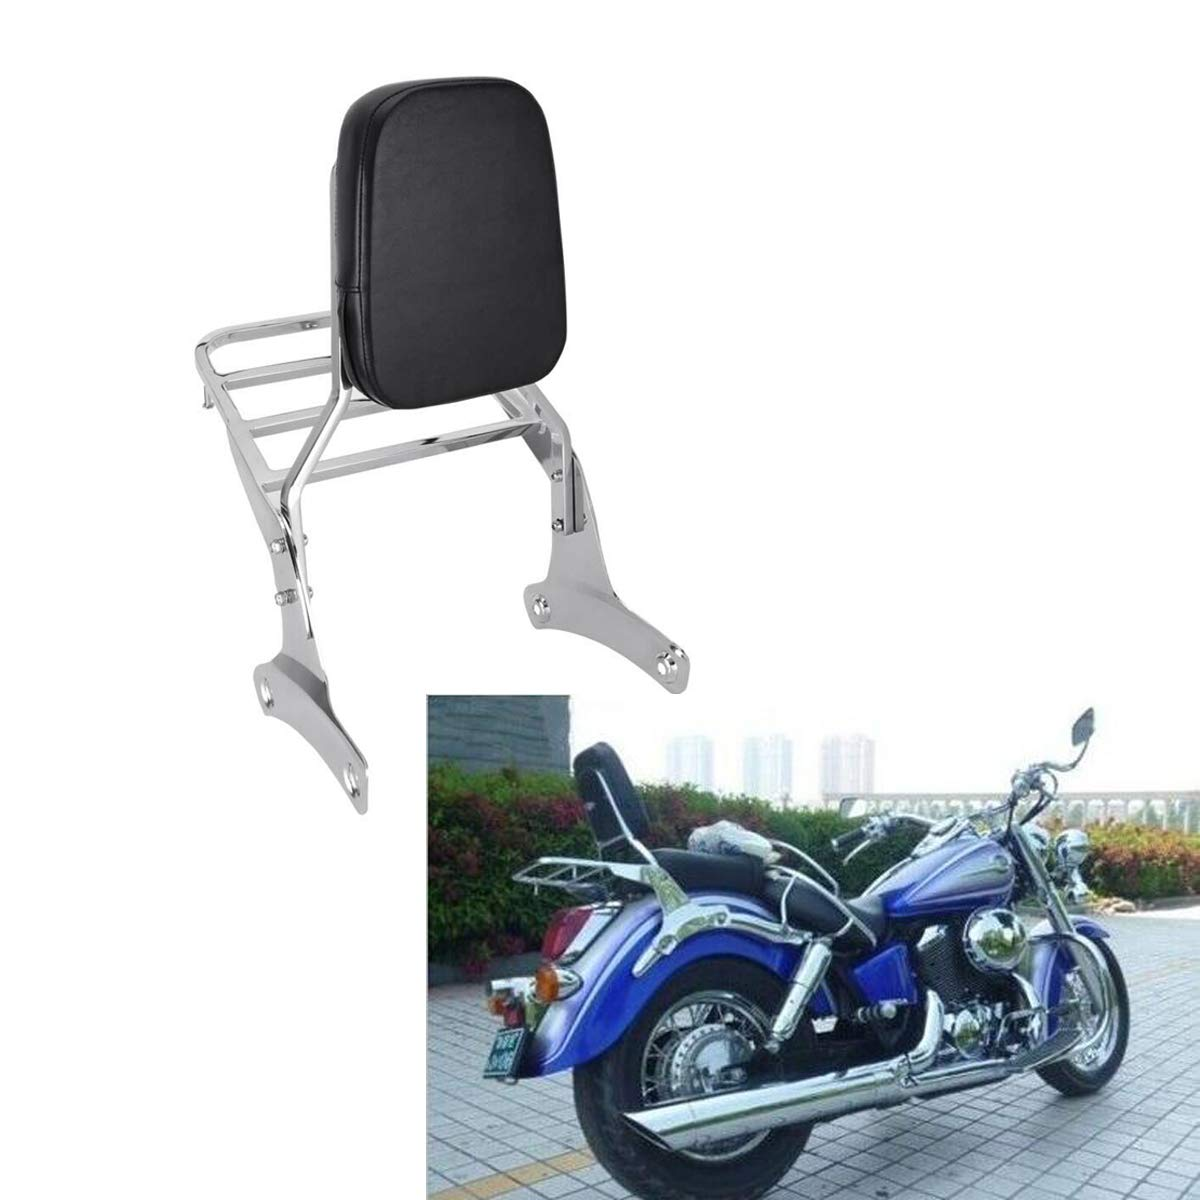 Mingting Detachable Chrome Sissy Bar Backrest Luggage Rack for Honda Shadow VT400//VT750 1998-2003